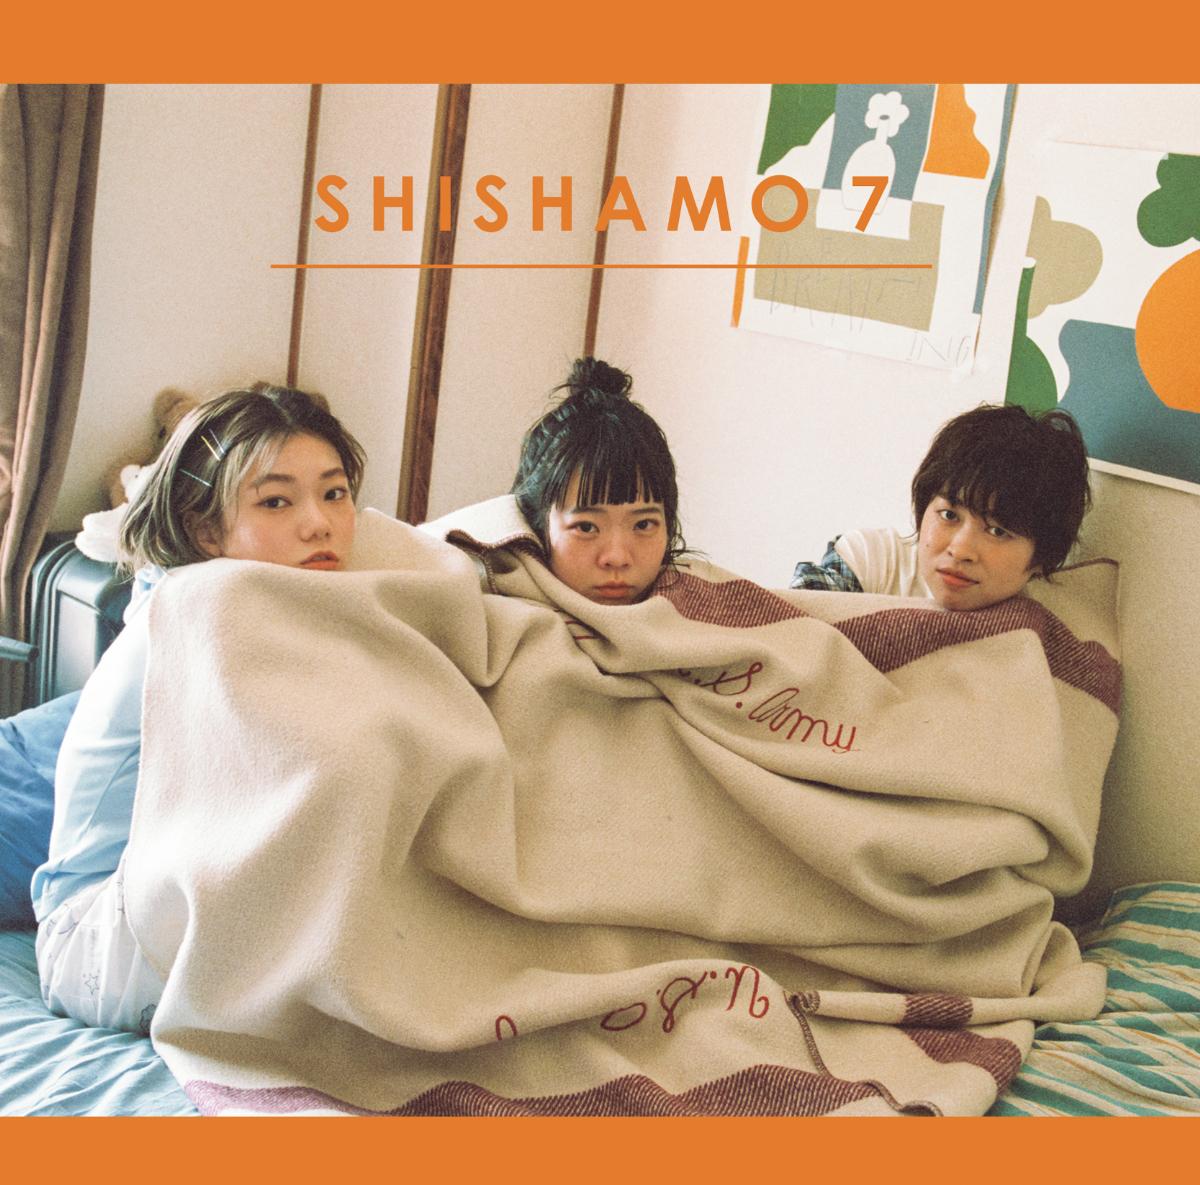 『SHISHAMO 7』通常盤